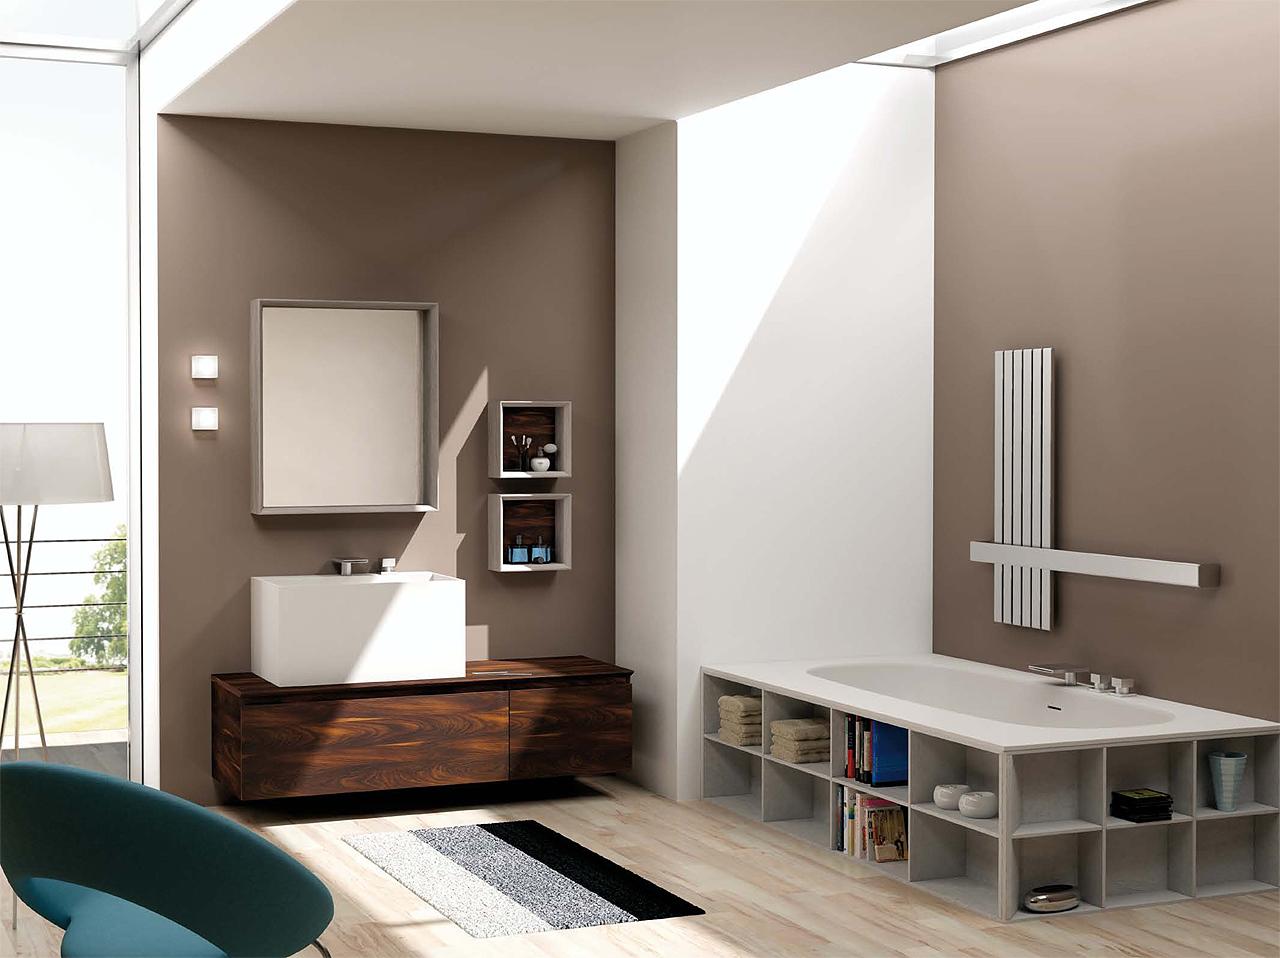 Lampadario camera ragazzi - Grancasa mobili ...